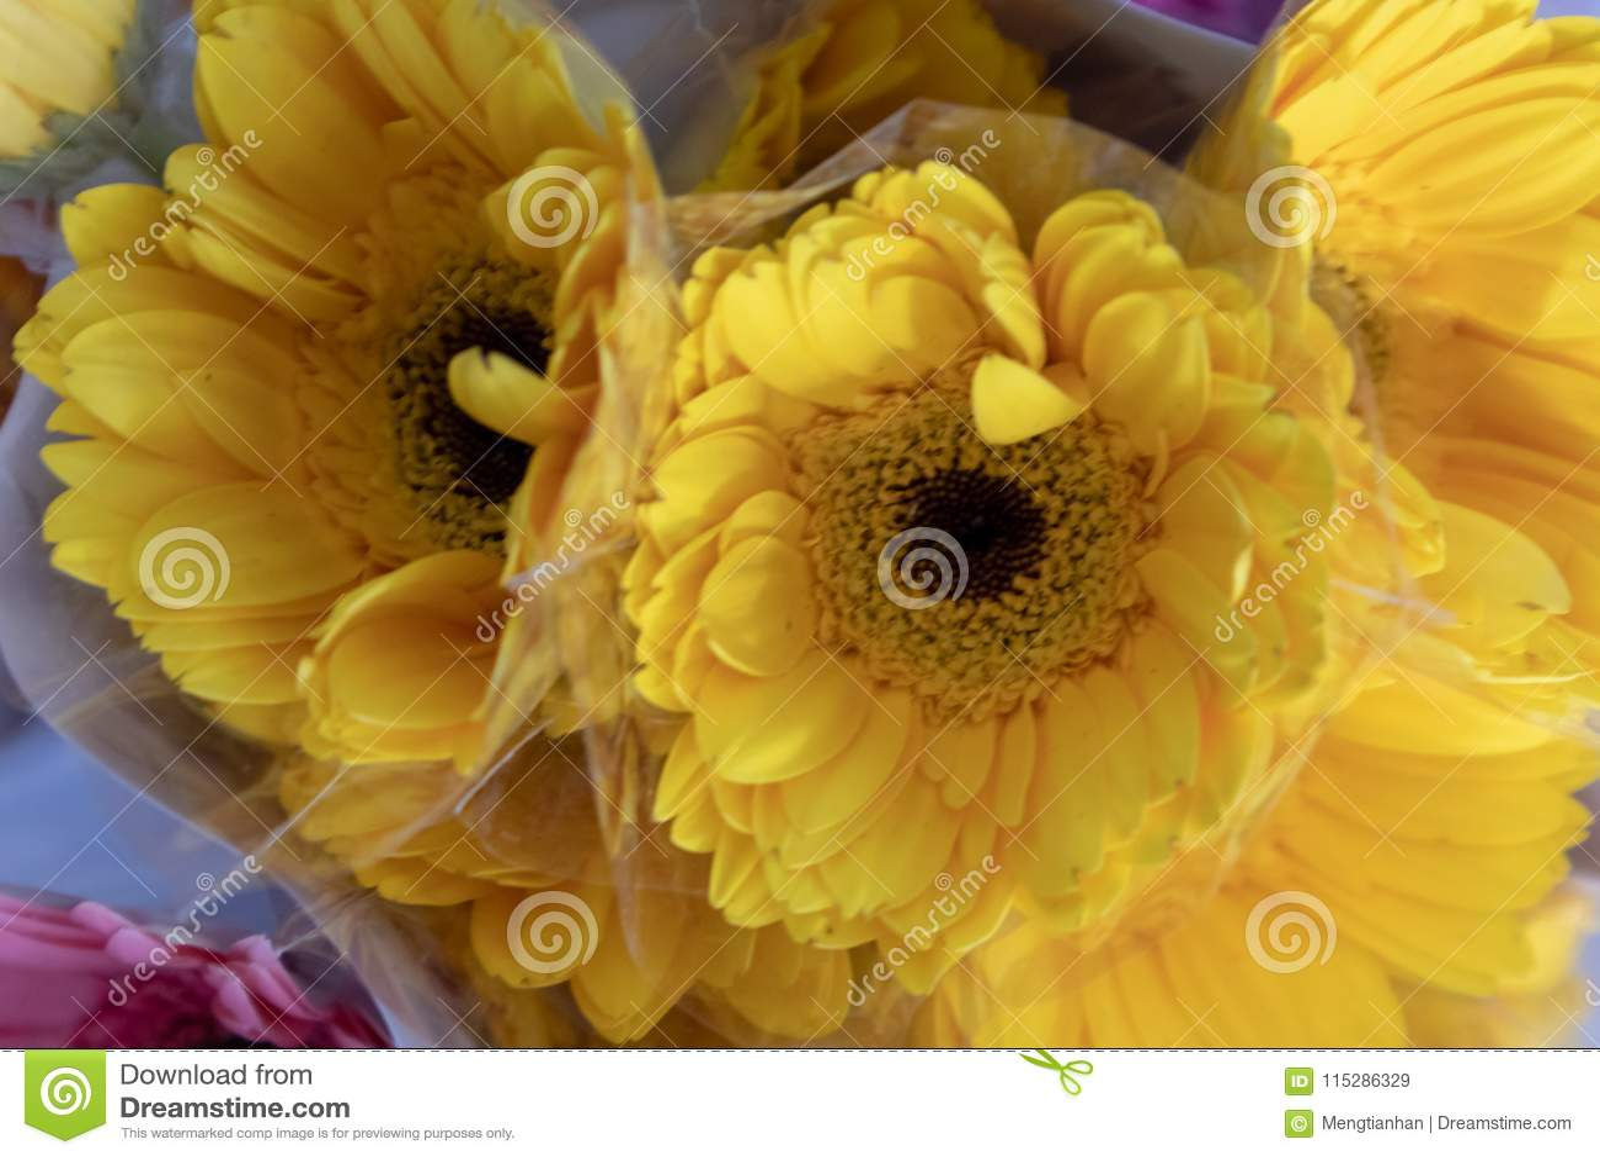 Gerbera Jamesonii Bolus Fresh Cut Flowers Stock Image Image Of